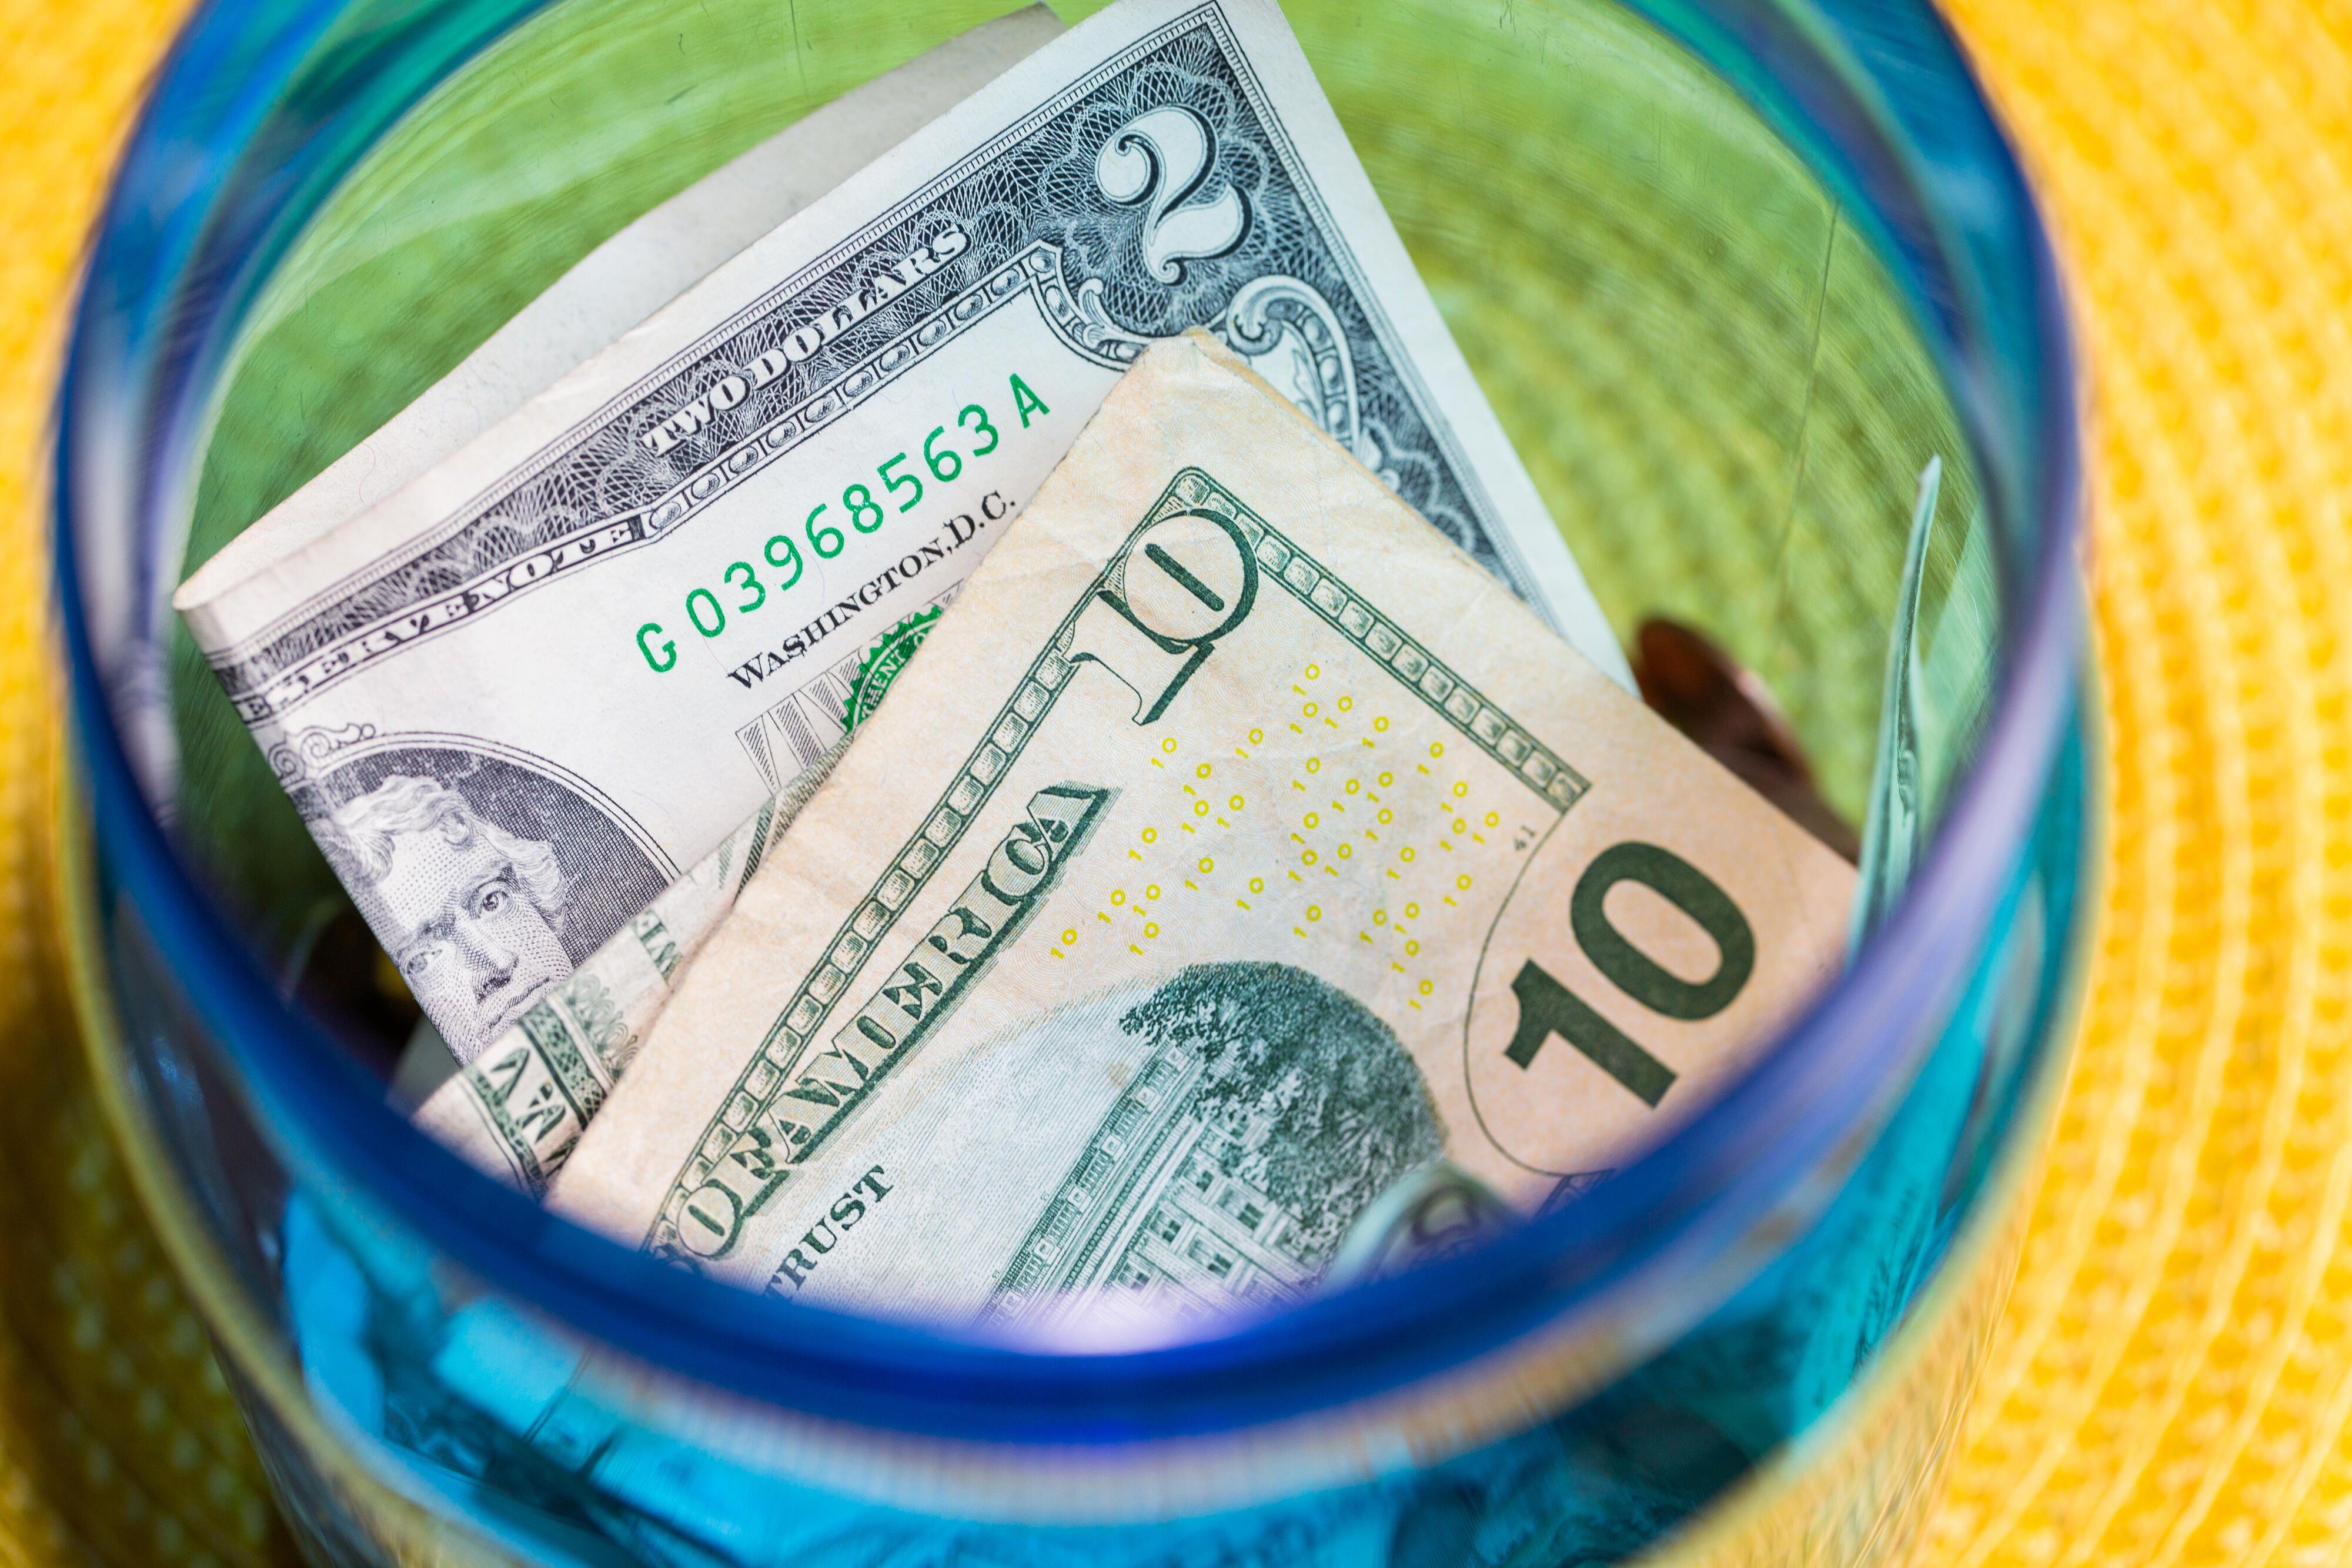 money-cash-dollars-bills-bank-stimulus-covid-finance-7139